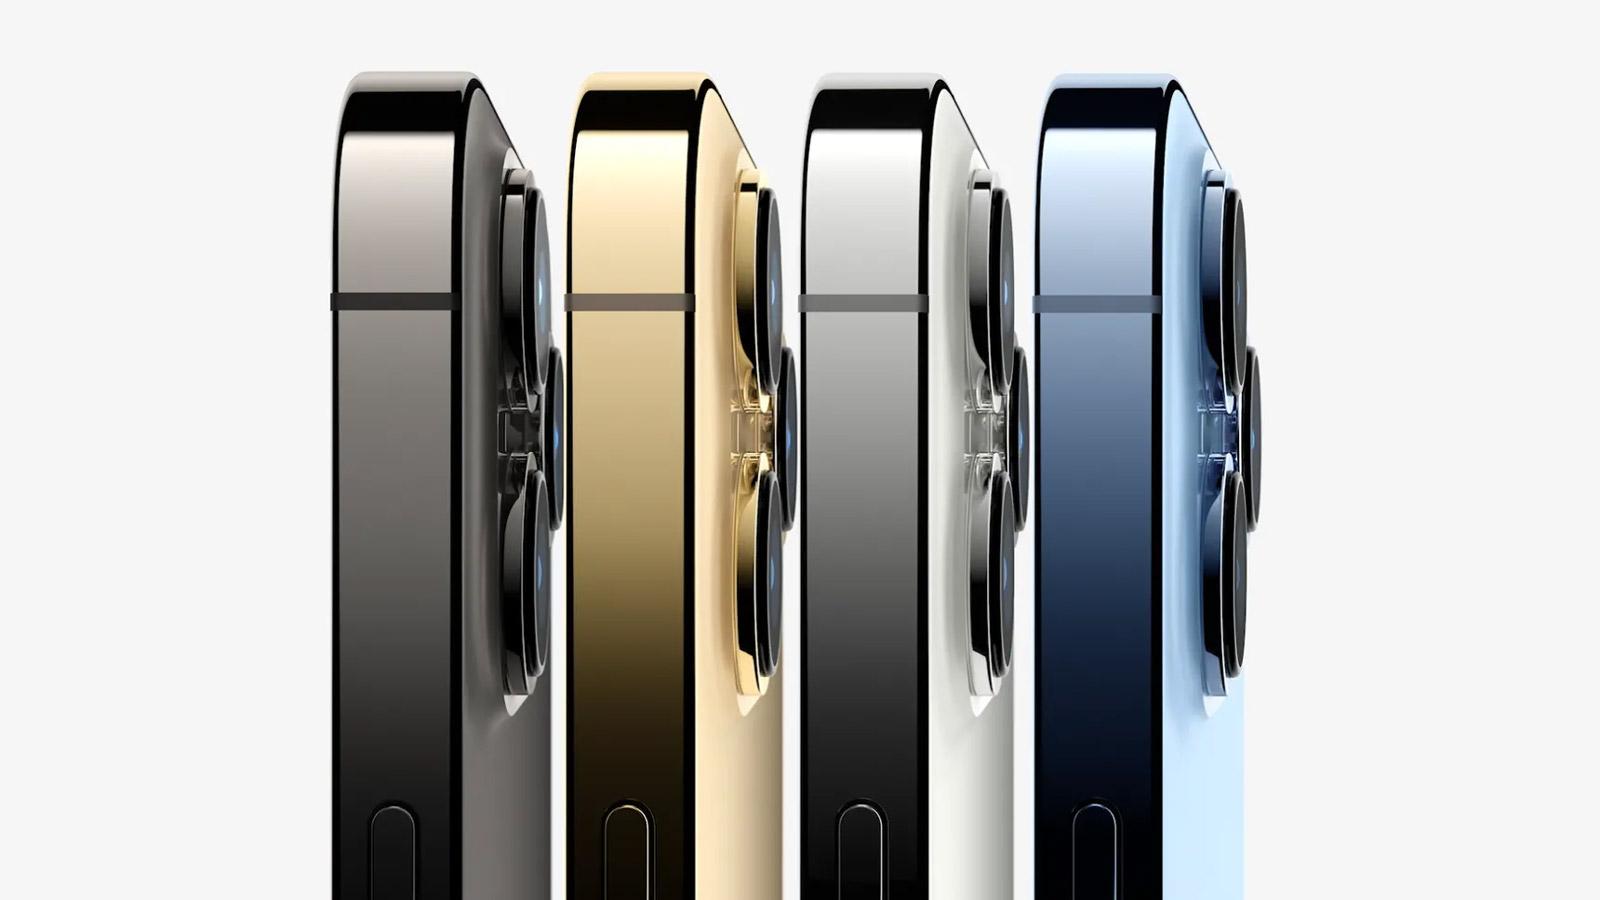 139120 Новинки от Apple — iPhone13, iPad, iPadMini. Исключительный эмейзинг!